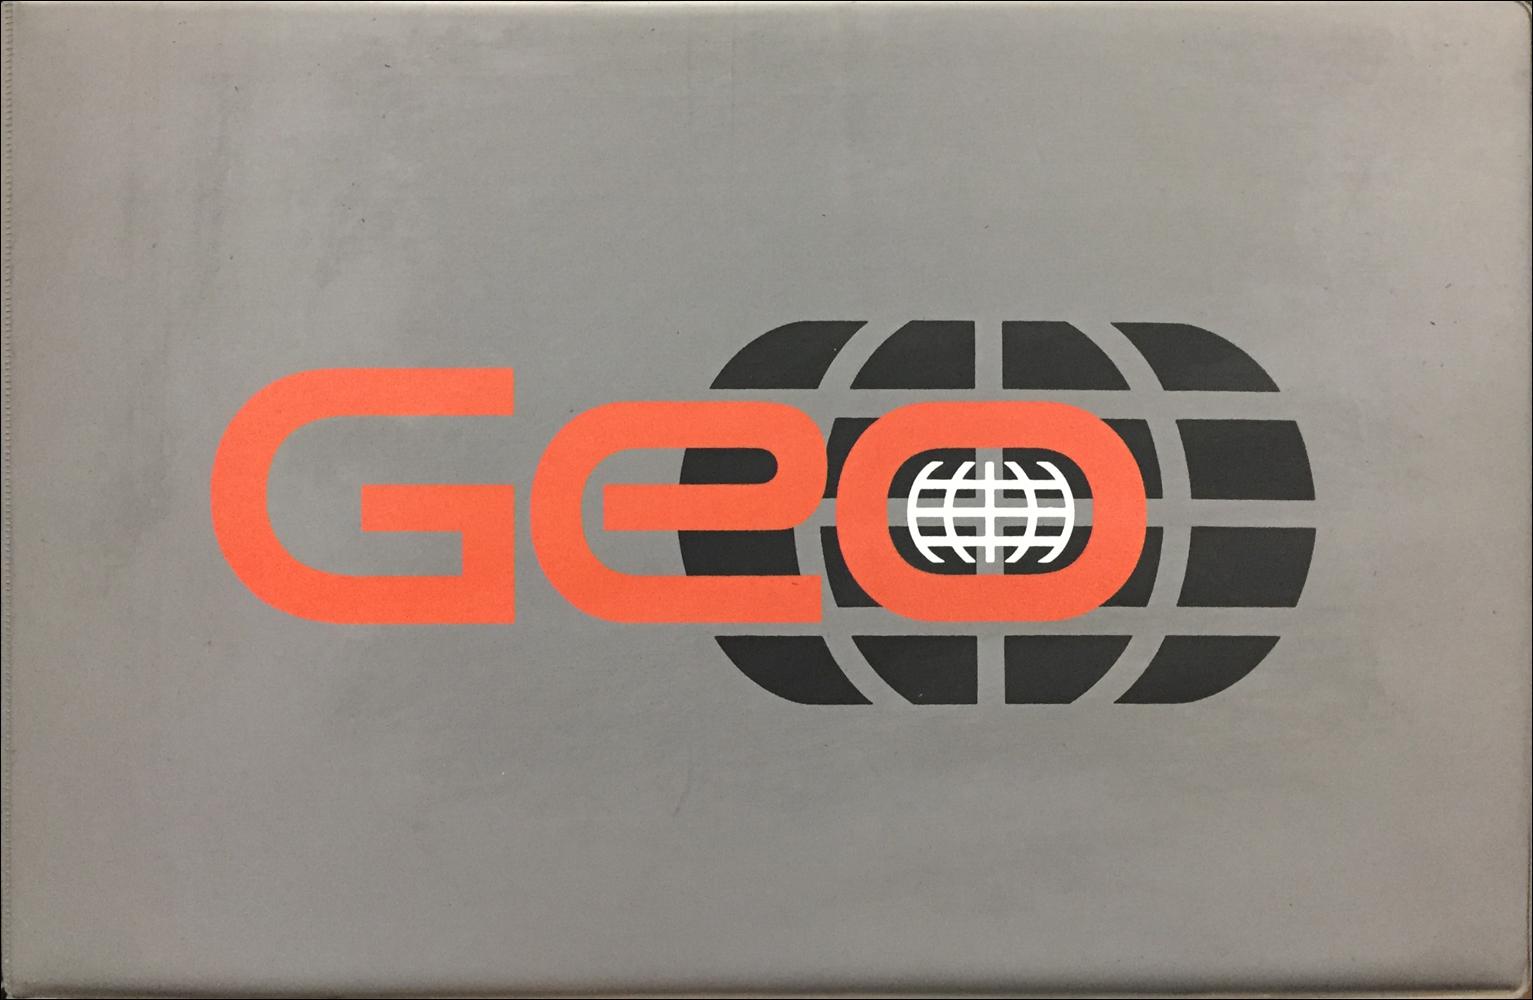 1991 geo color \u0026 upholstery dealer album data book original1991 Geo Tracker Electrical Diagnosis Manual Original #17